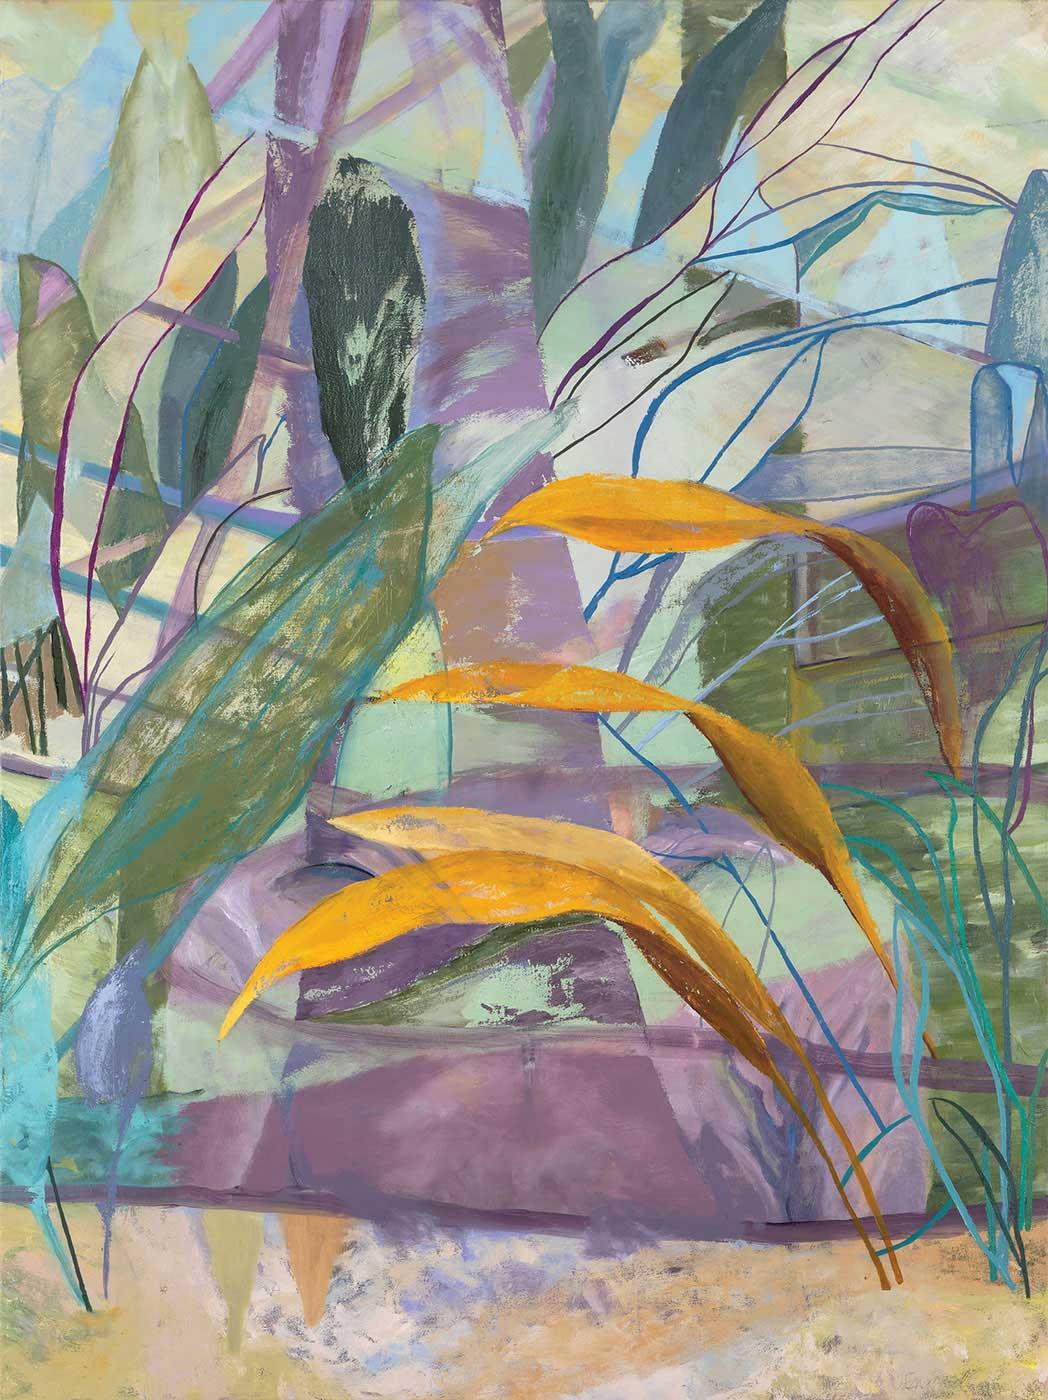 Julie S. England - Aspidistras Arches 3